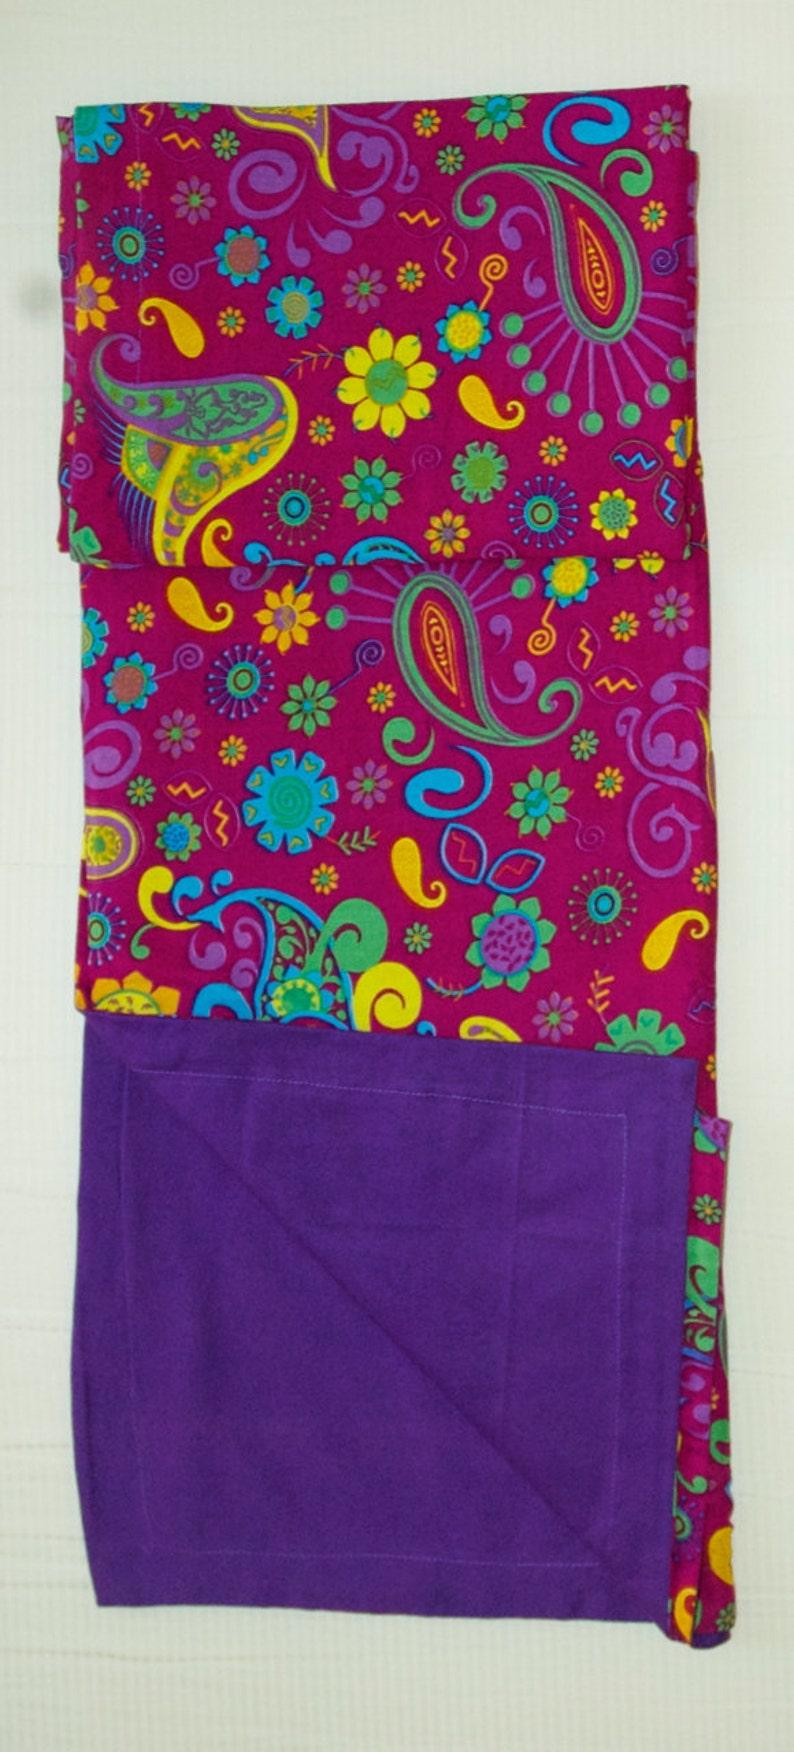 Blanket Fun Retro Purple Paisley Floor Blanket For Baby Girl ~ Cotton